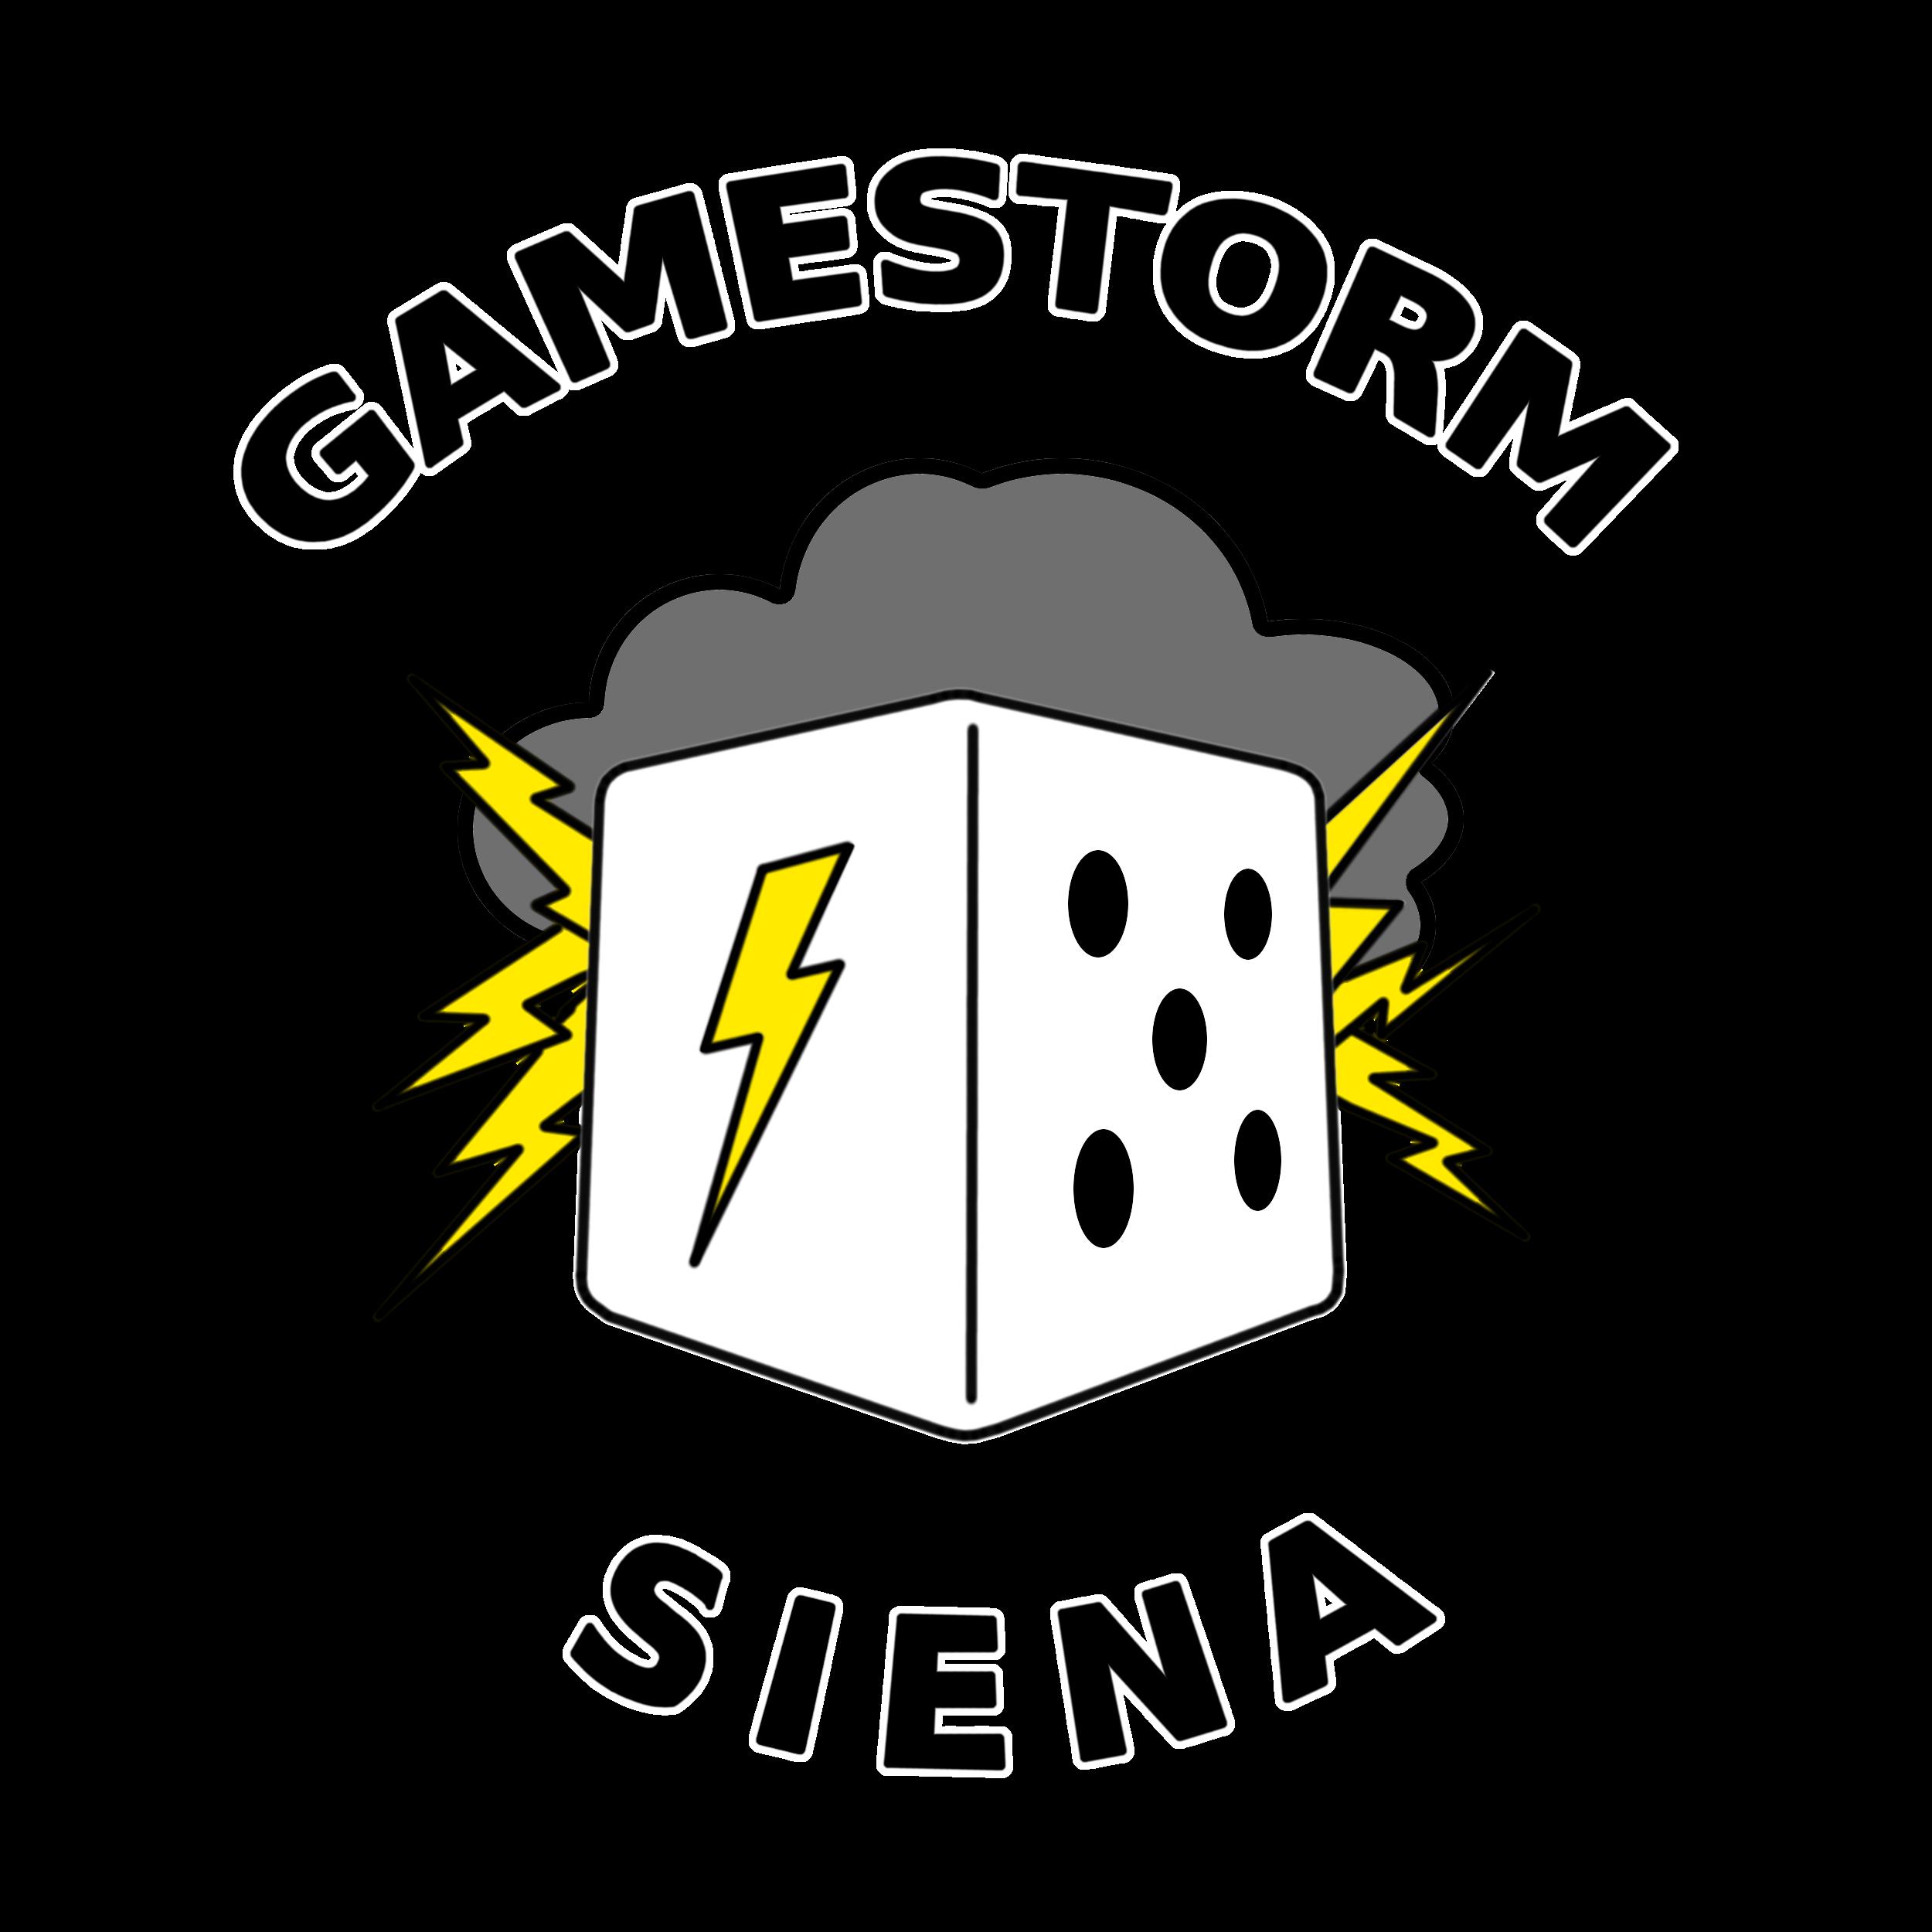 GameStorm-Siena